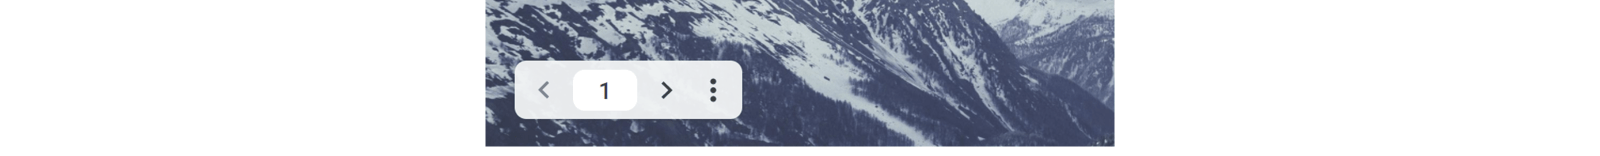 Screenshot of present mode toolbar in Google Slides